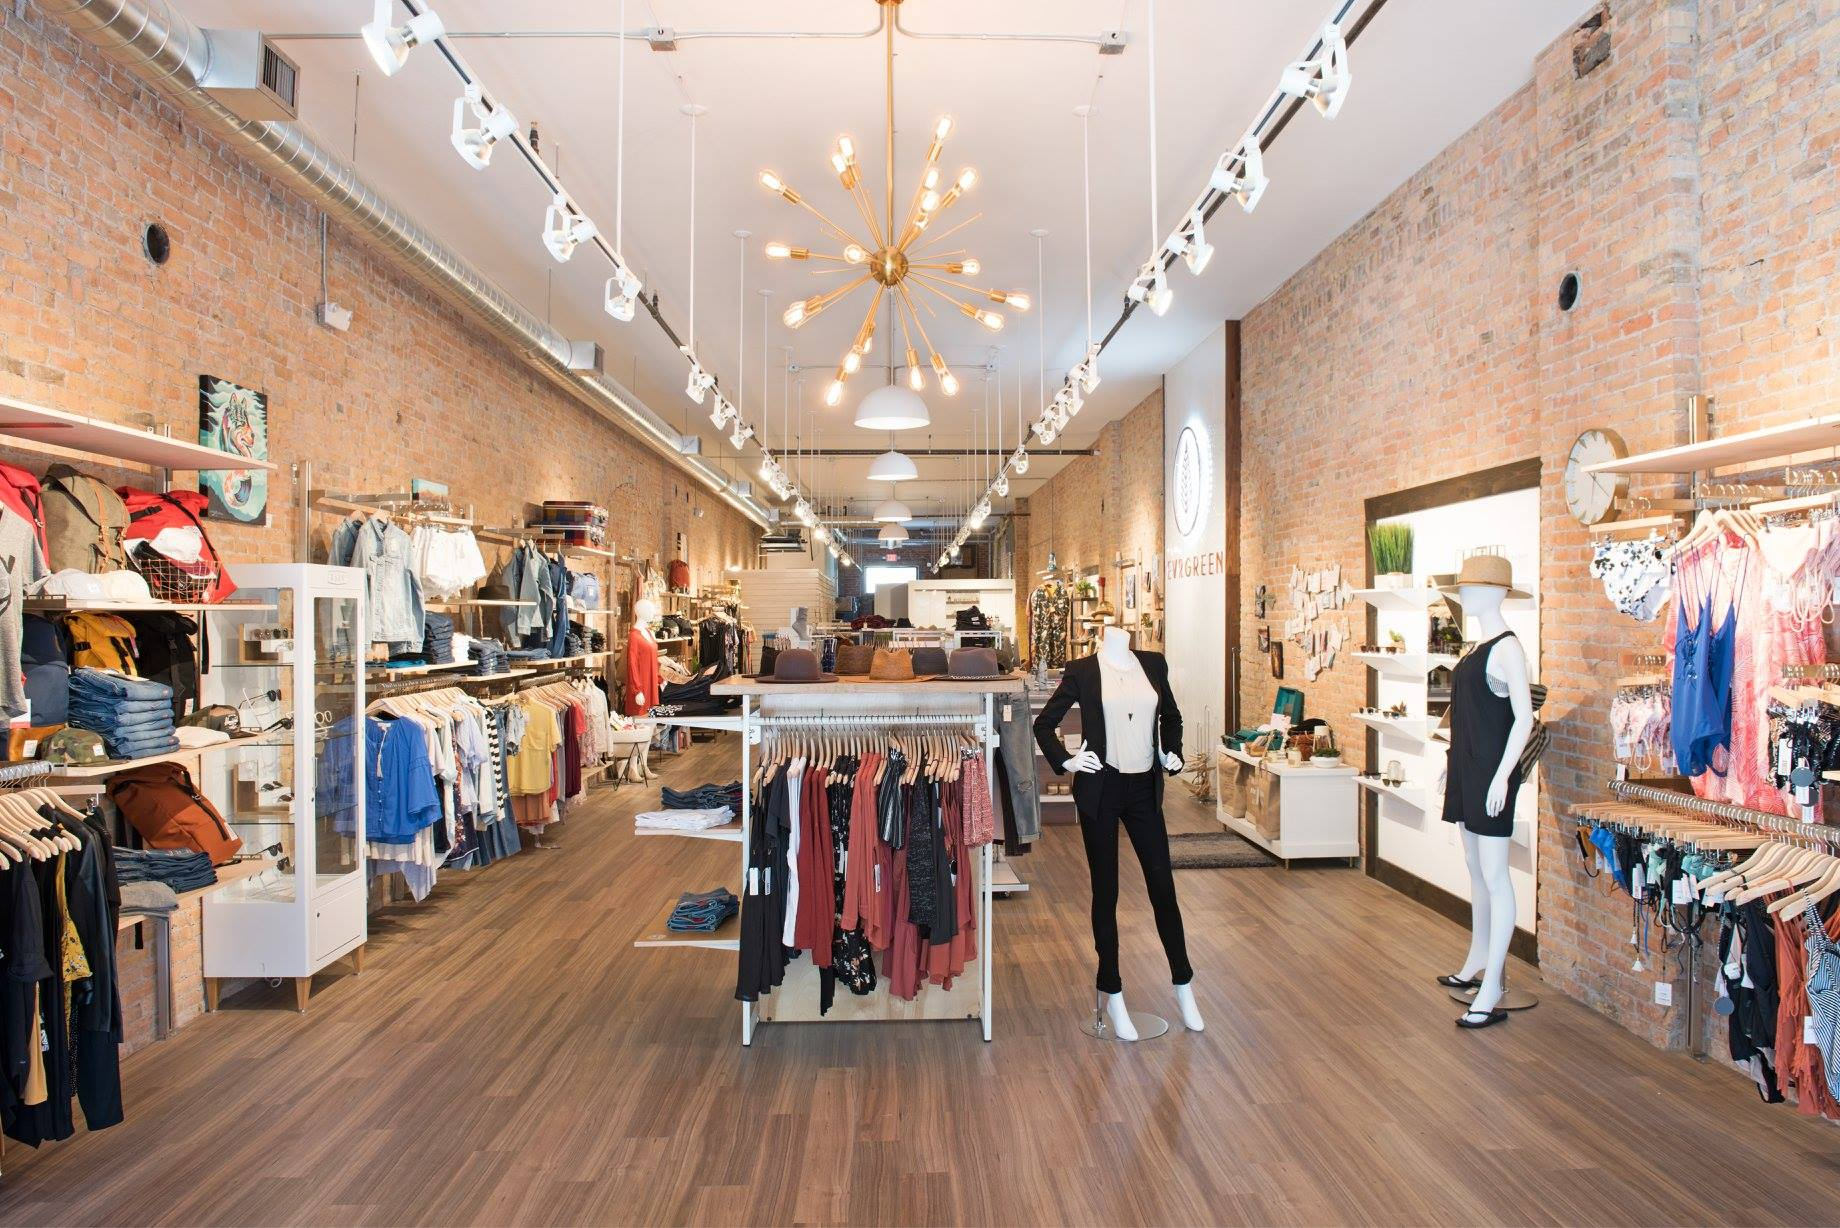 Evrgreen Clothing - Downtown Bozeman Boutique